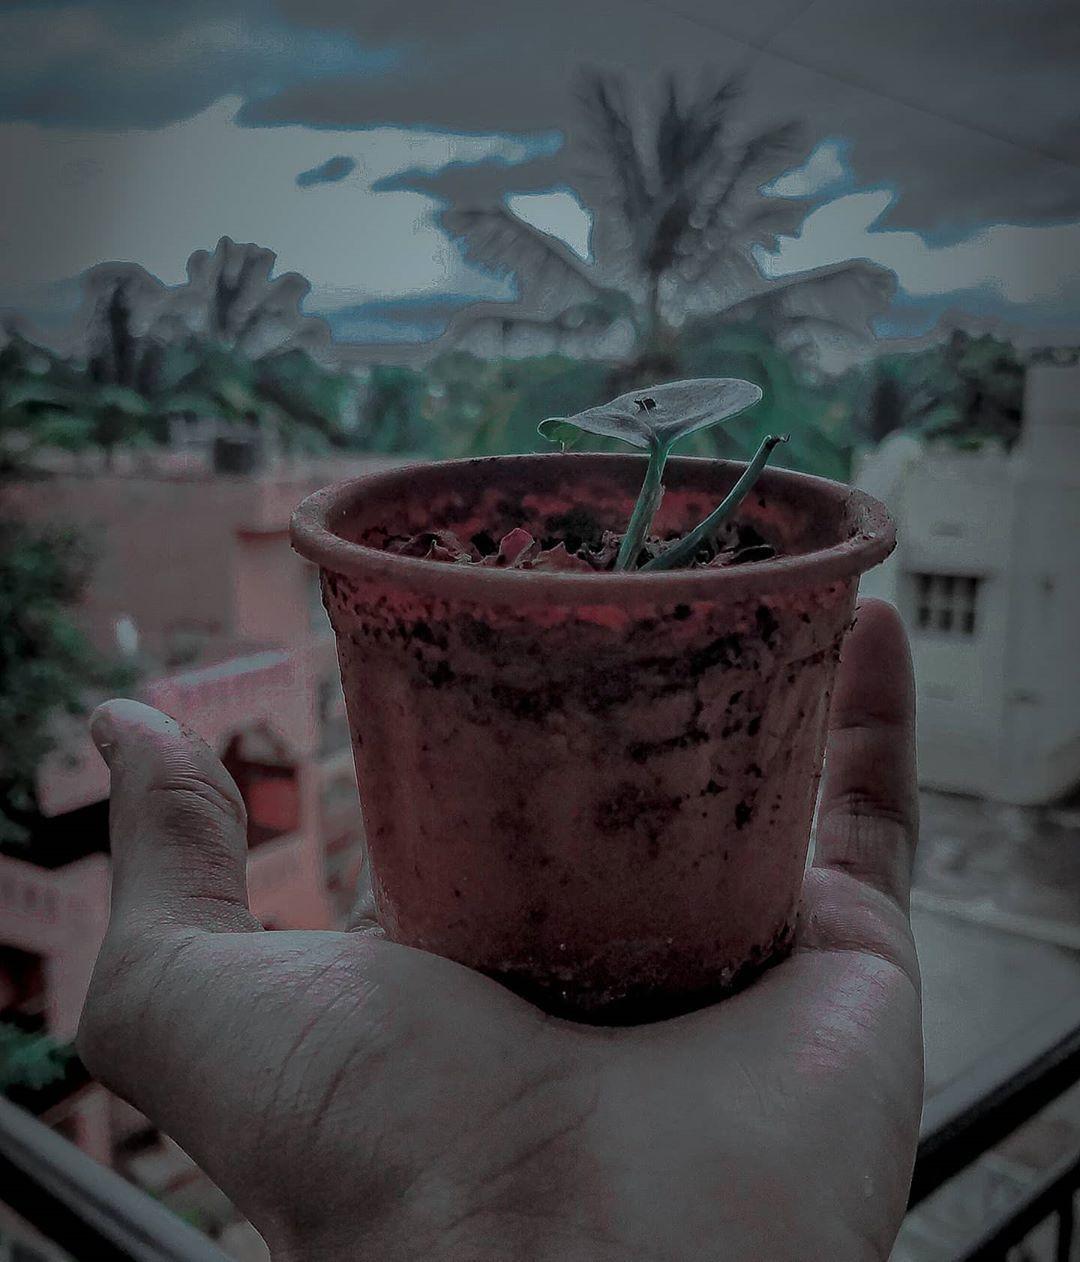 حياة وسط بؤس🌱✨ الصورة كاملة في #الستوري  ★٭ . . . #india #karnataka #bangalore #plants #planet #life #dispair #bright #green #photo #photography #photographer #death #hope #human #humanity #loveliveserve #thankyou #camera #lightroom #photoedit #shot #shotoniphone #picsart #pure #love #peace #salam #war   @lightroom @xiaomi.global @xiaomiindia @redmiindia @redmik_20pro @miuiofficial @miuiindiaofficial